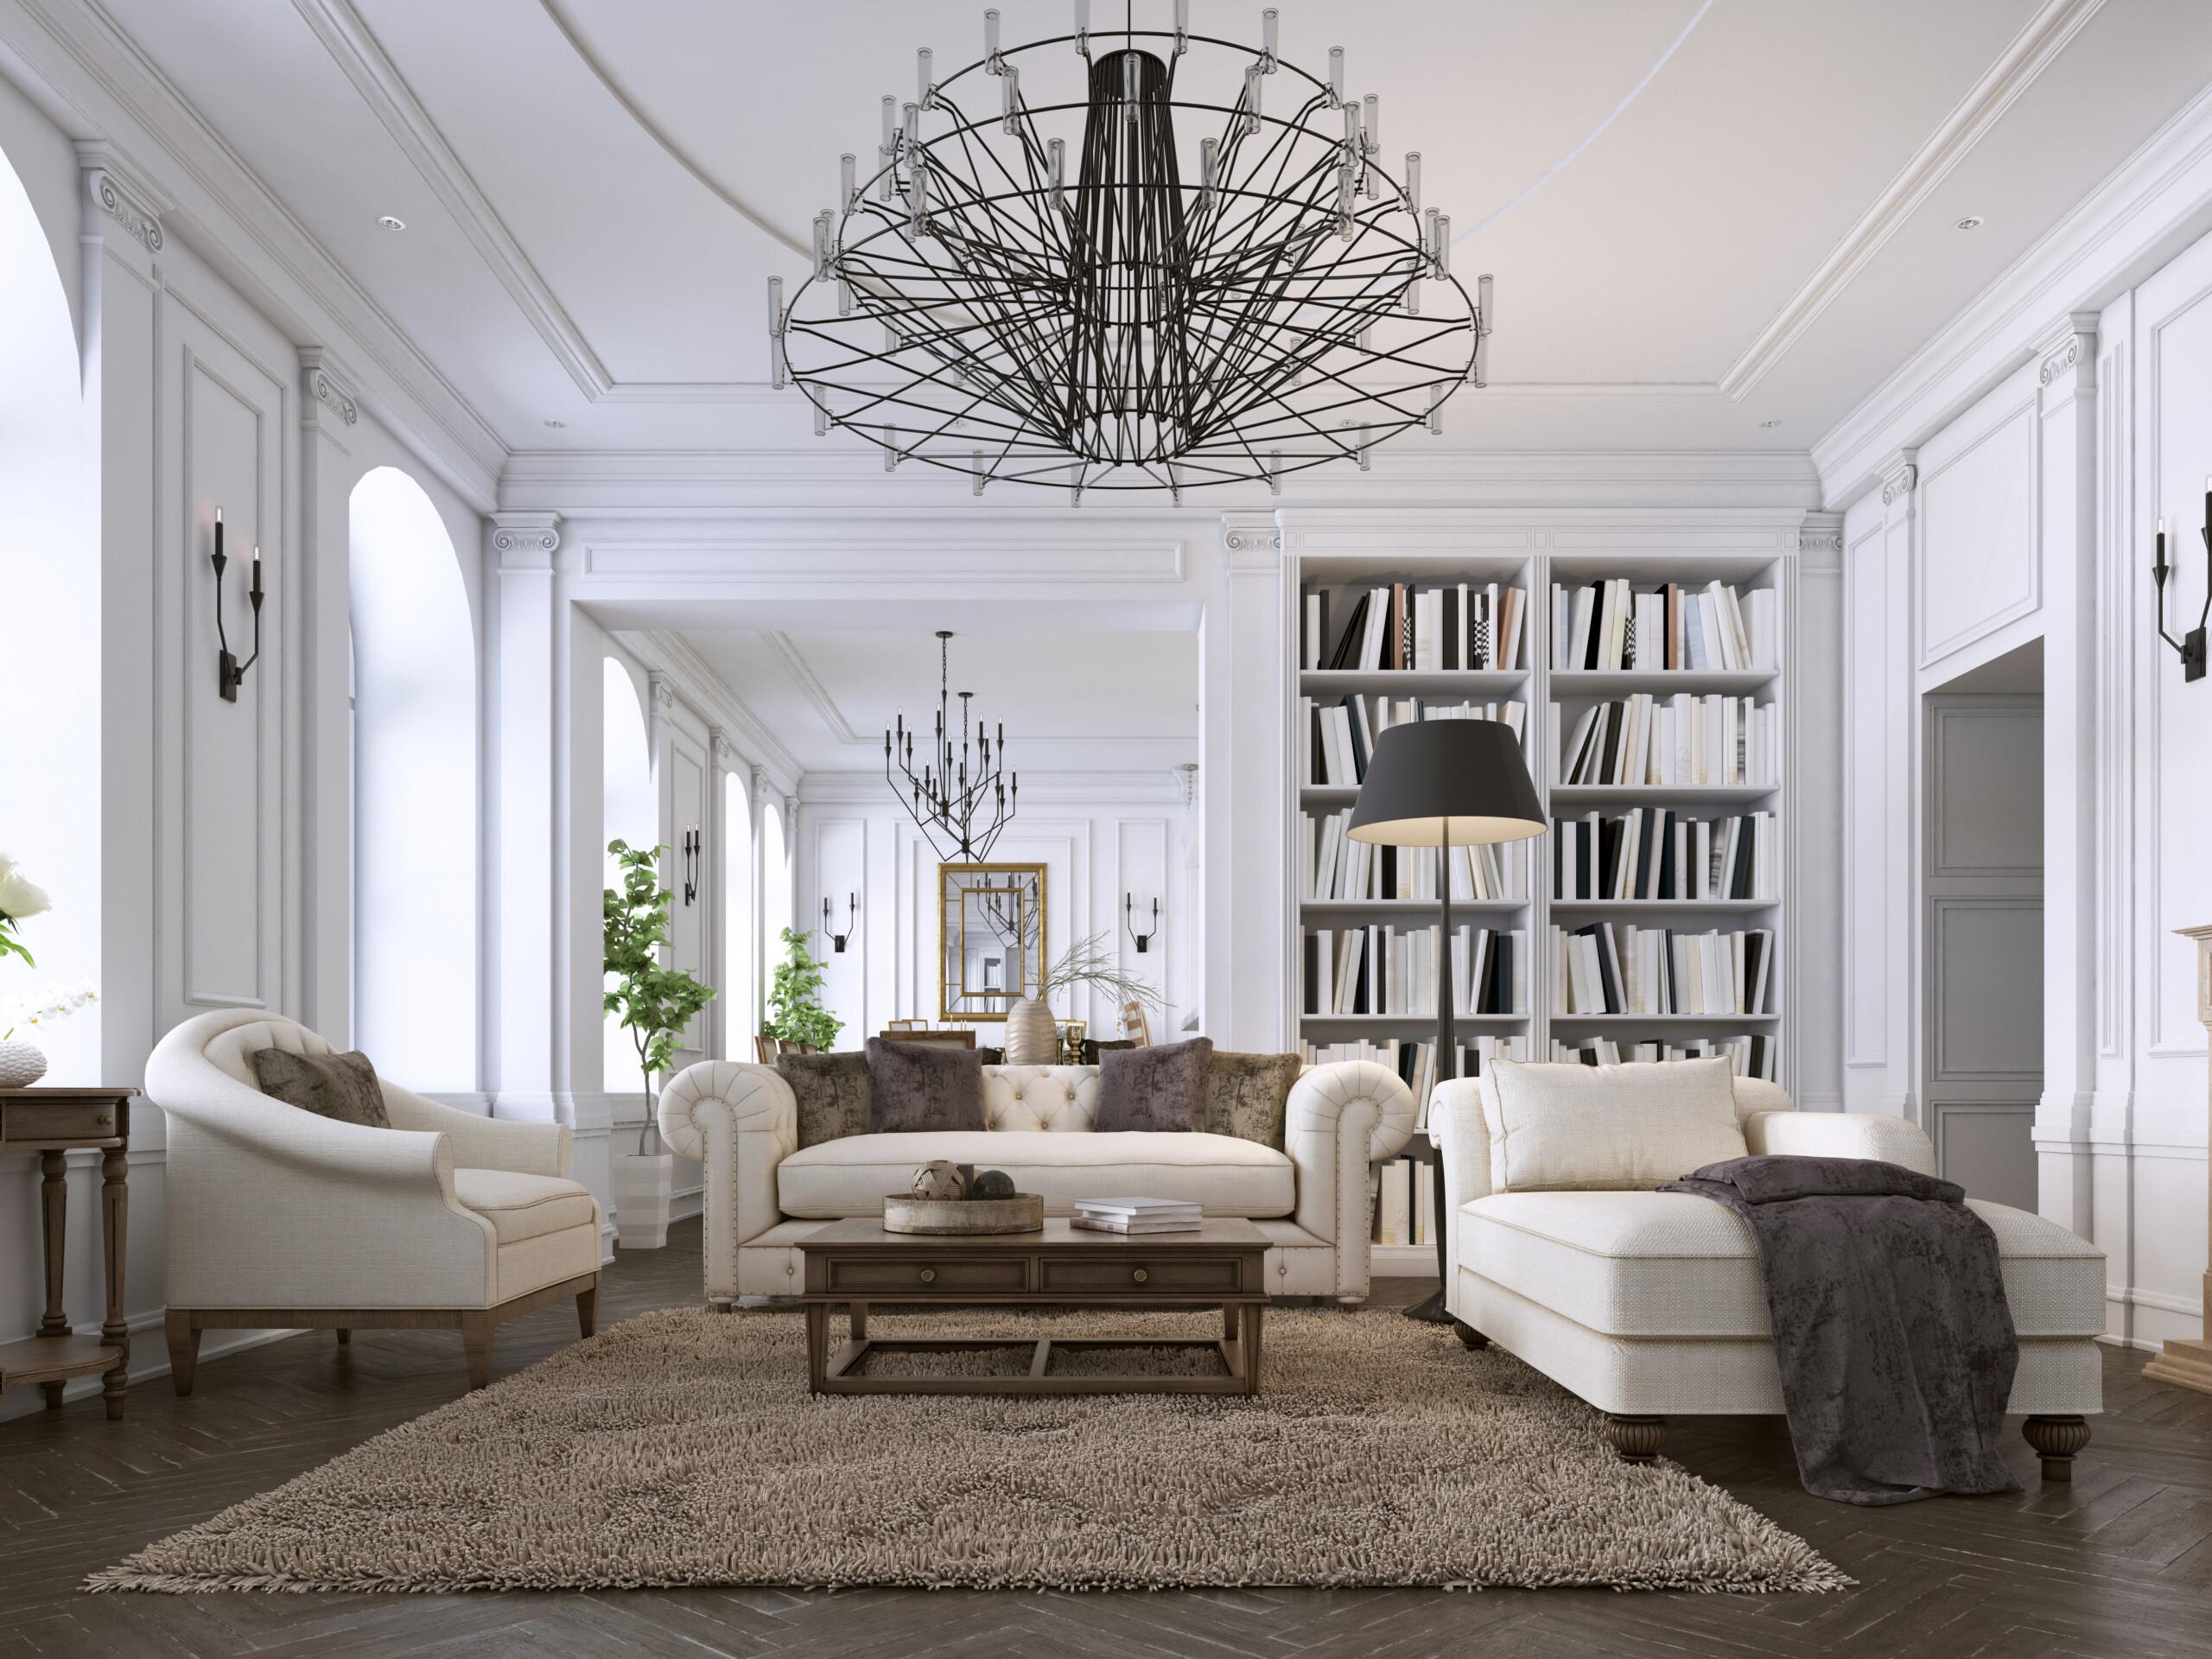 8 Luxurious Living Room Interior Design, Living Room Luxury